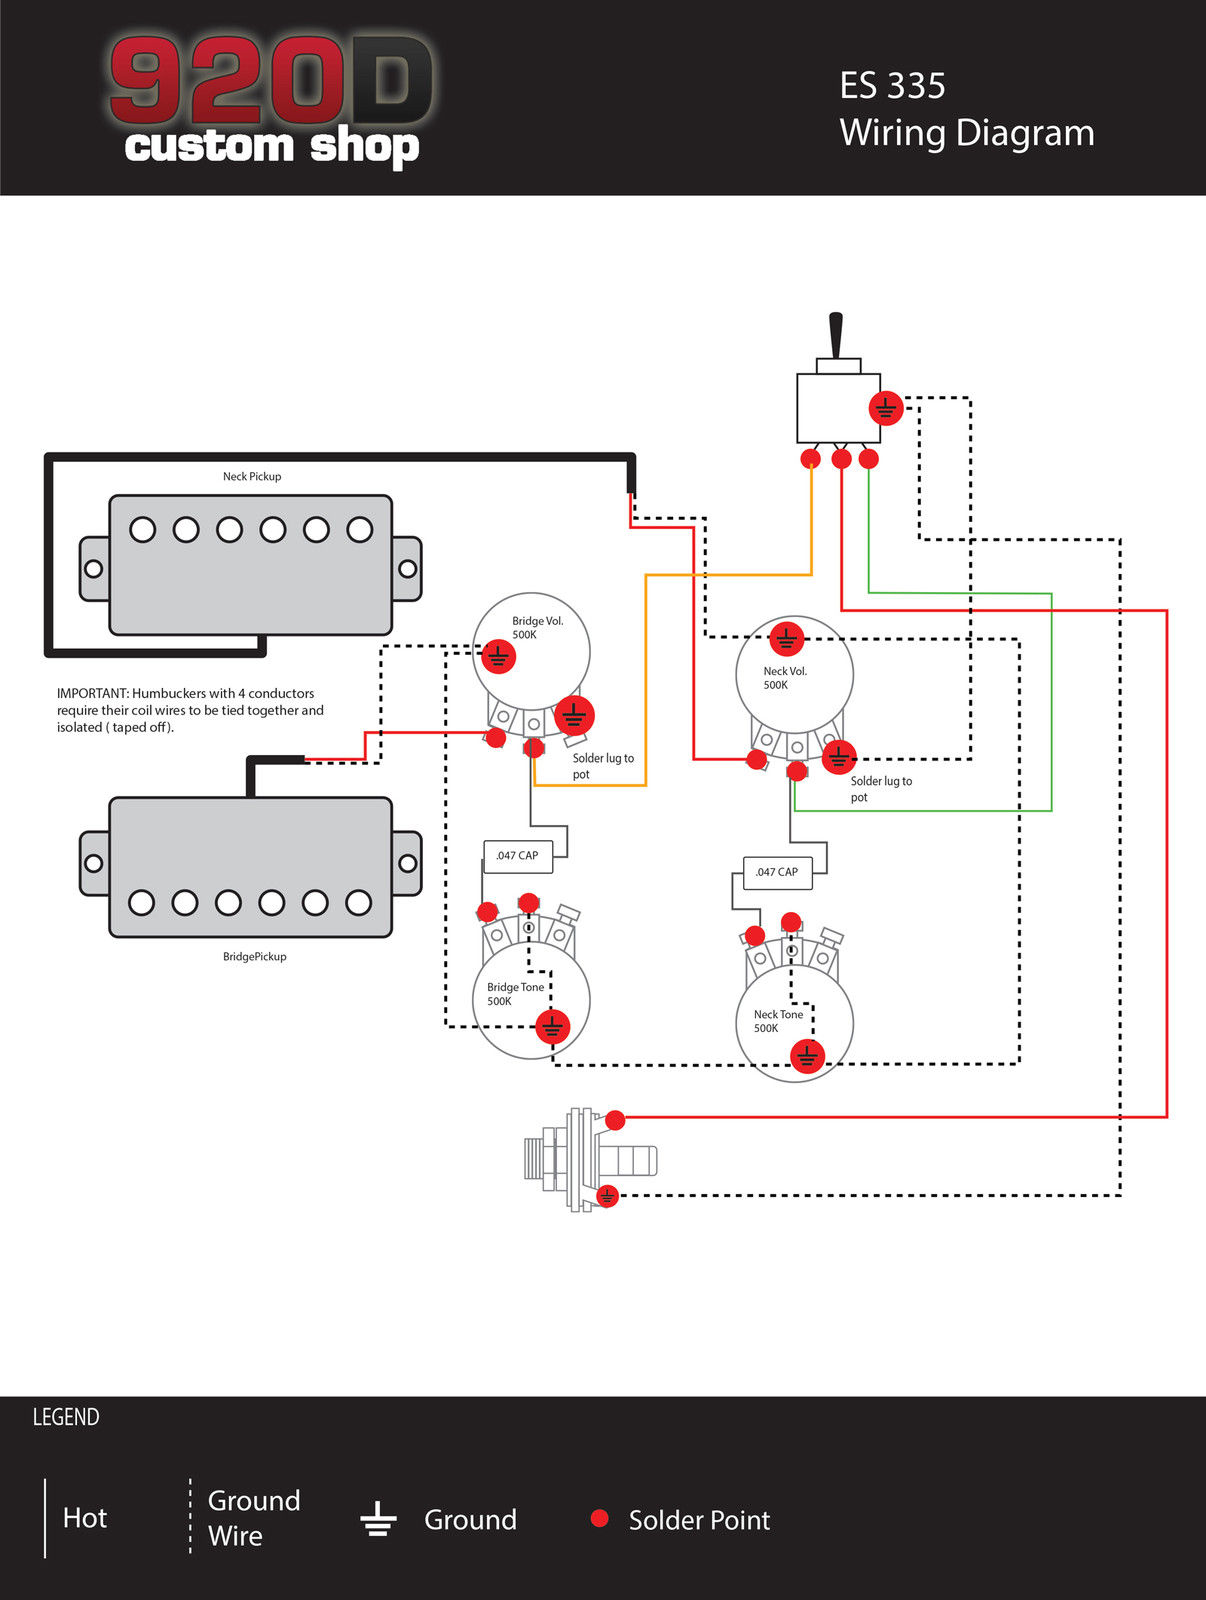 Lap Steel Wiring Diagram Supro Get Free Image About Wiring Diagram